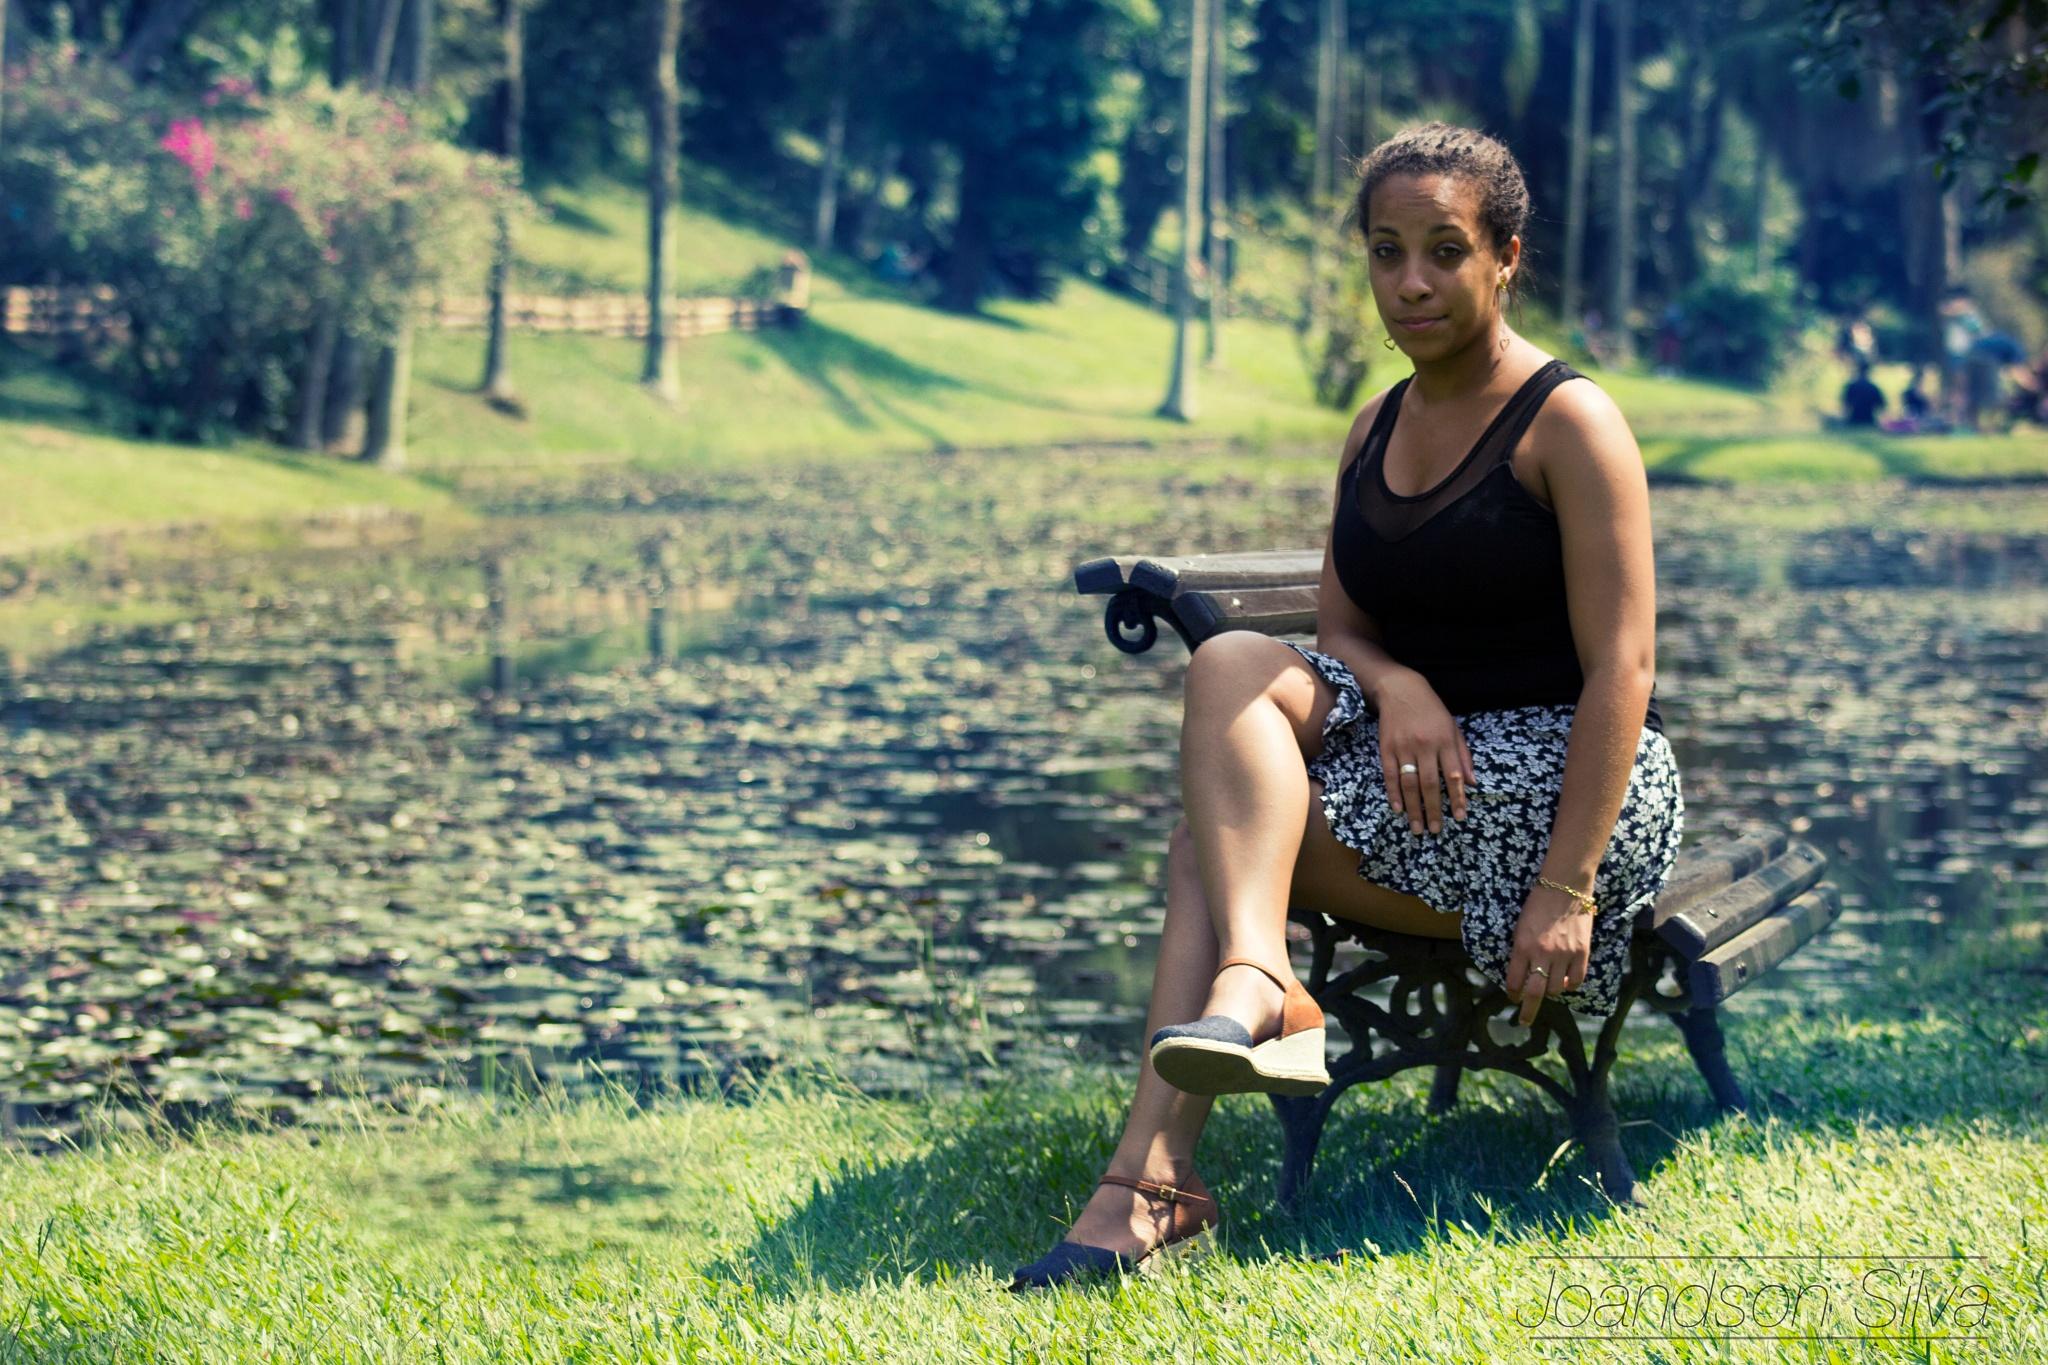 Sabrina Santos by Joandson Silva